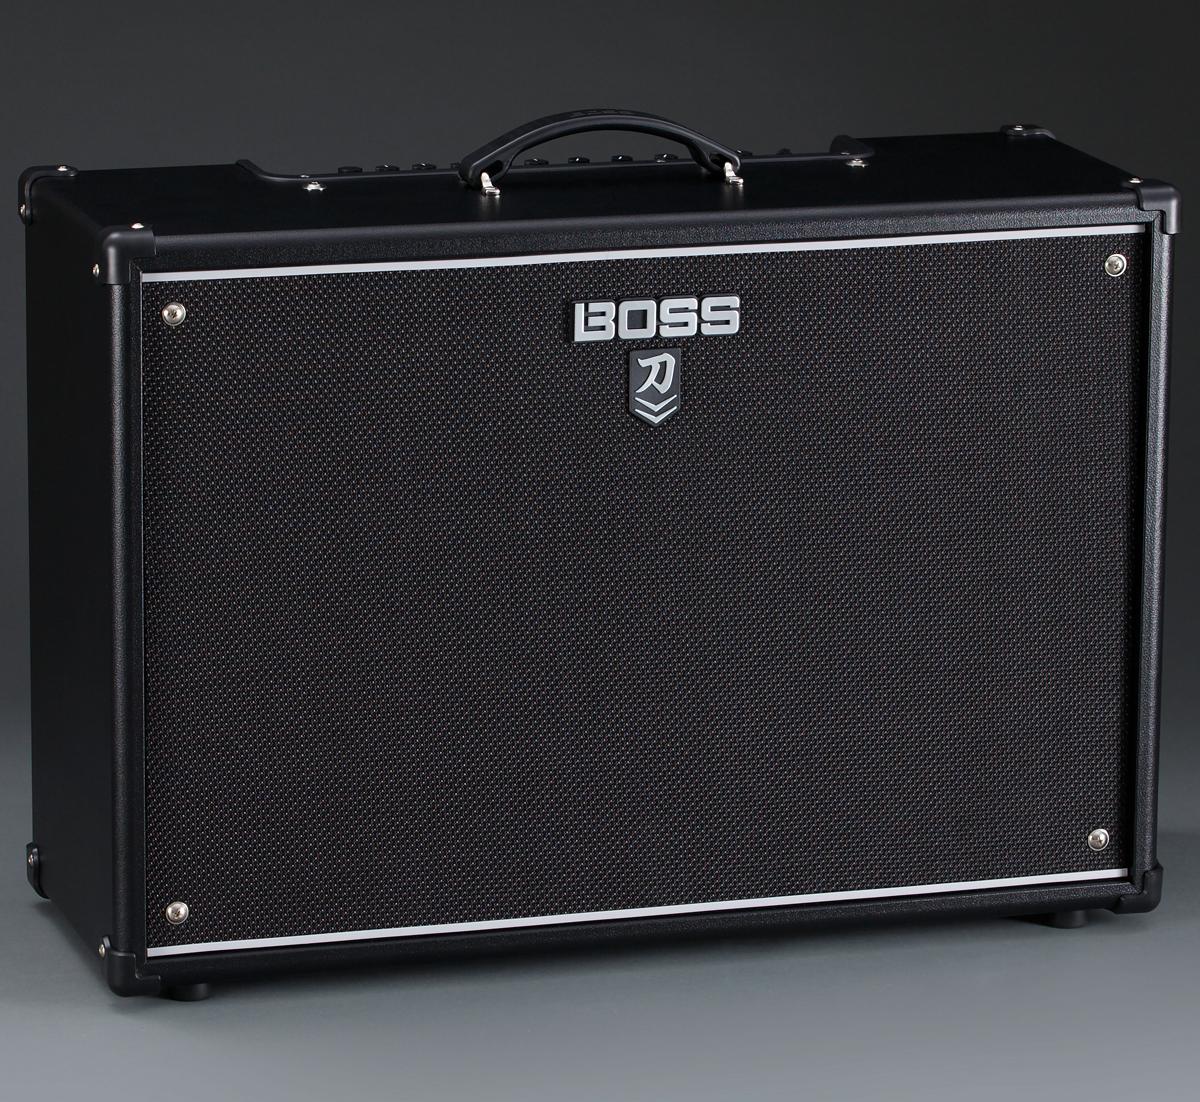 BOSS KATANA-100/212 MkII 新品 ギター用コンボアンプ[ボス][刀シリーズ][マーク2][Guitar Combo Amplifier]